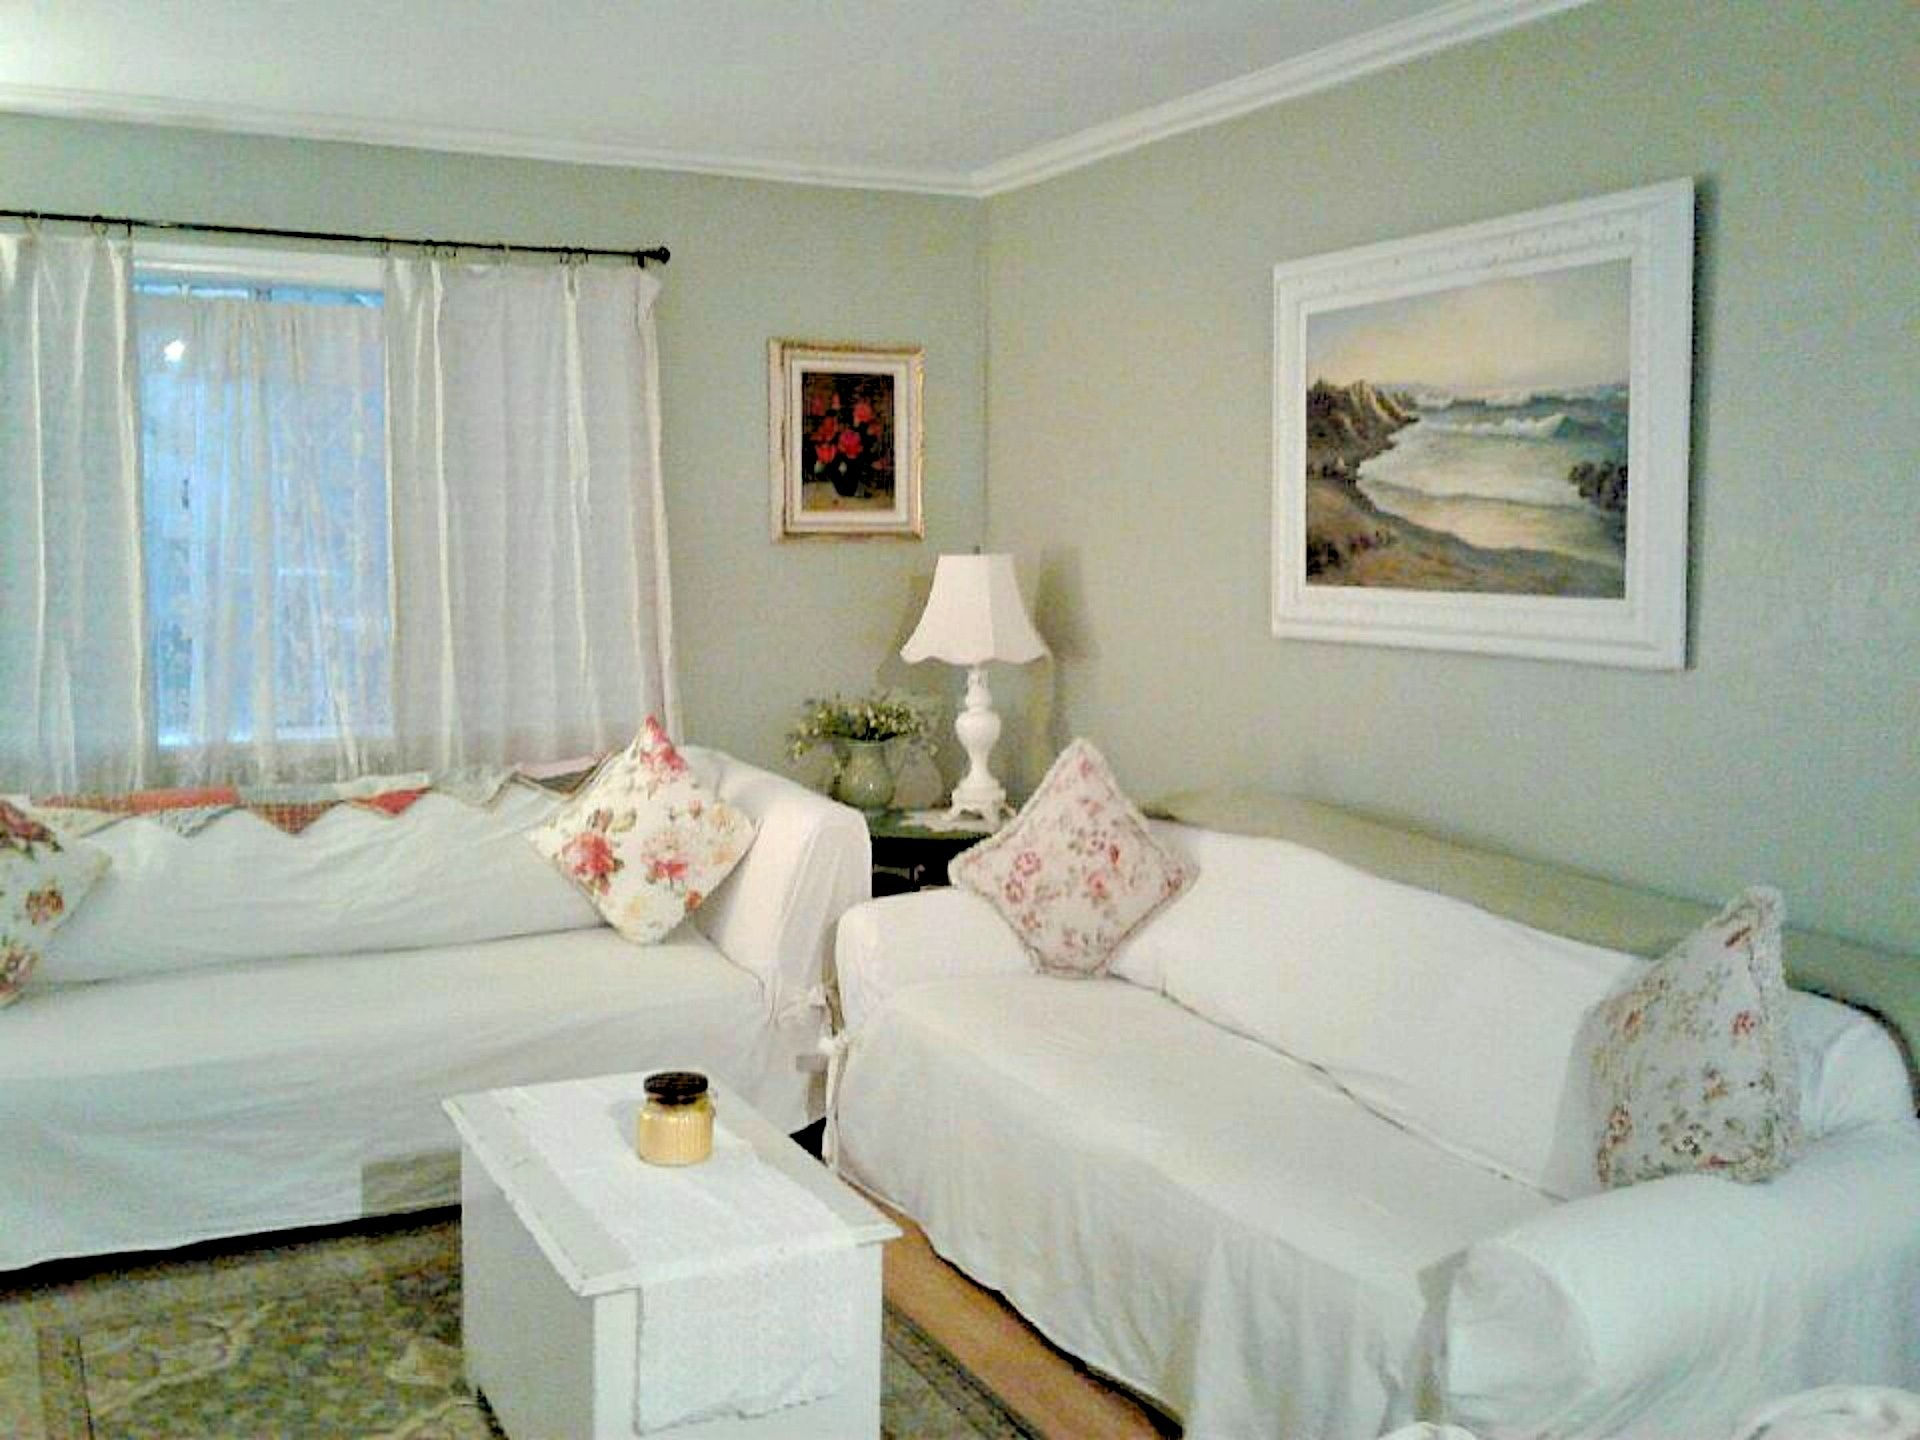 2 Bed Short Term Rental Condo Oceanside